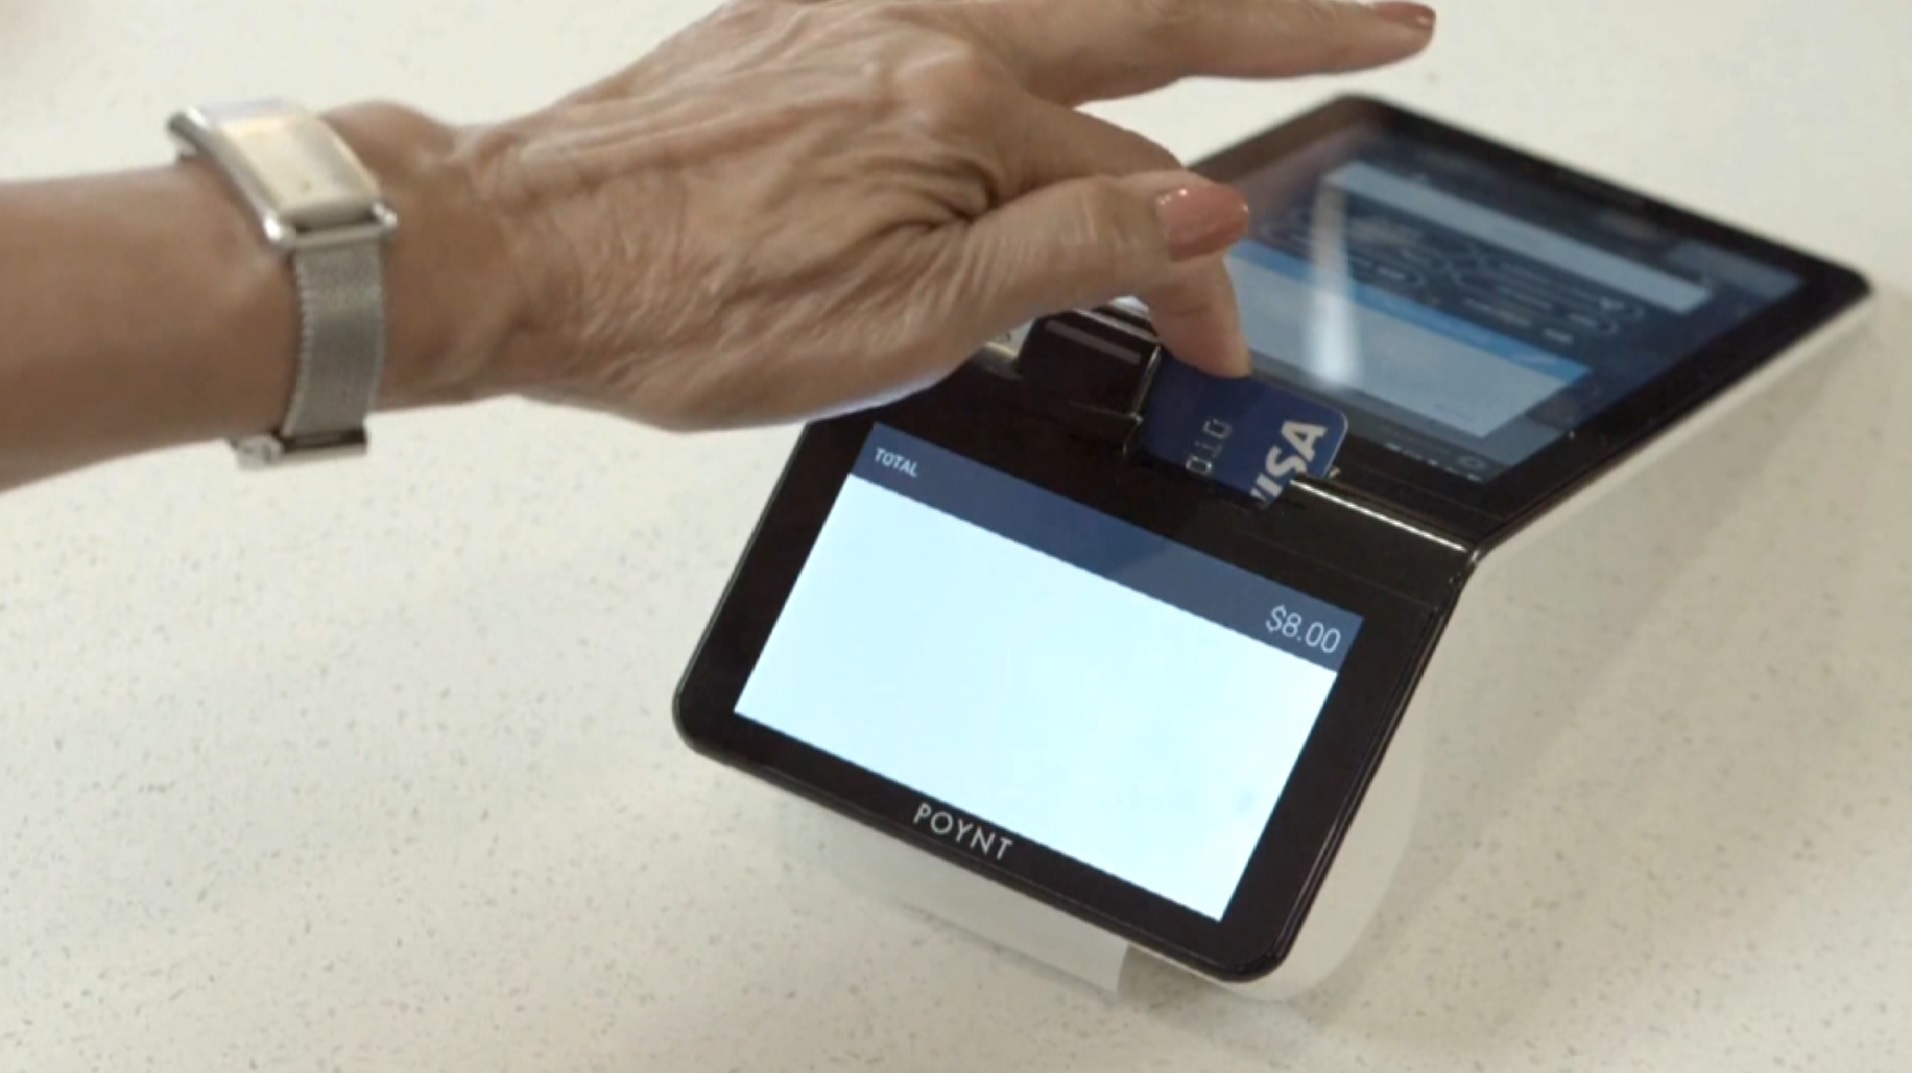 cloned debit card web_410163